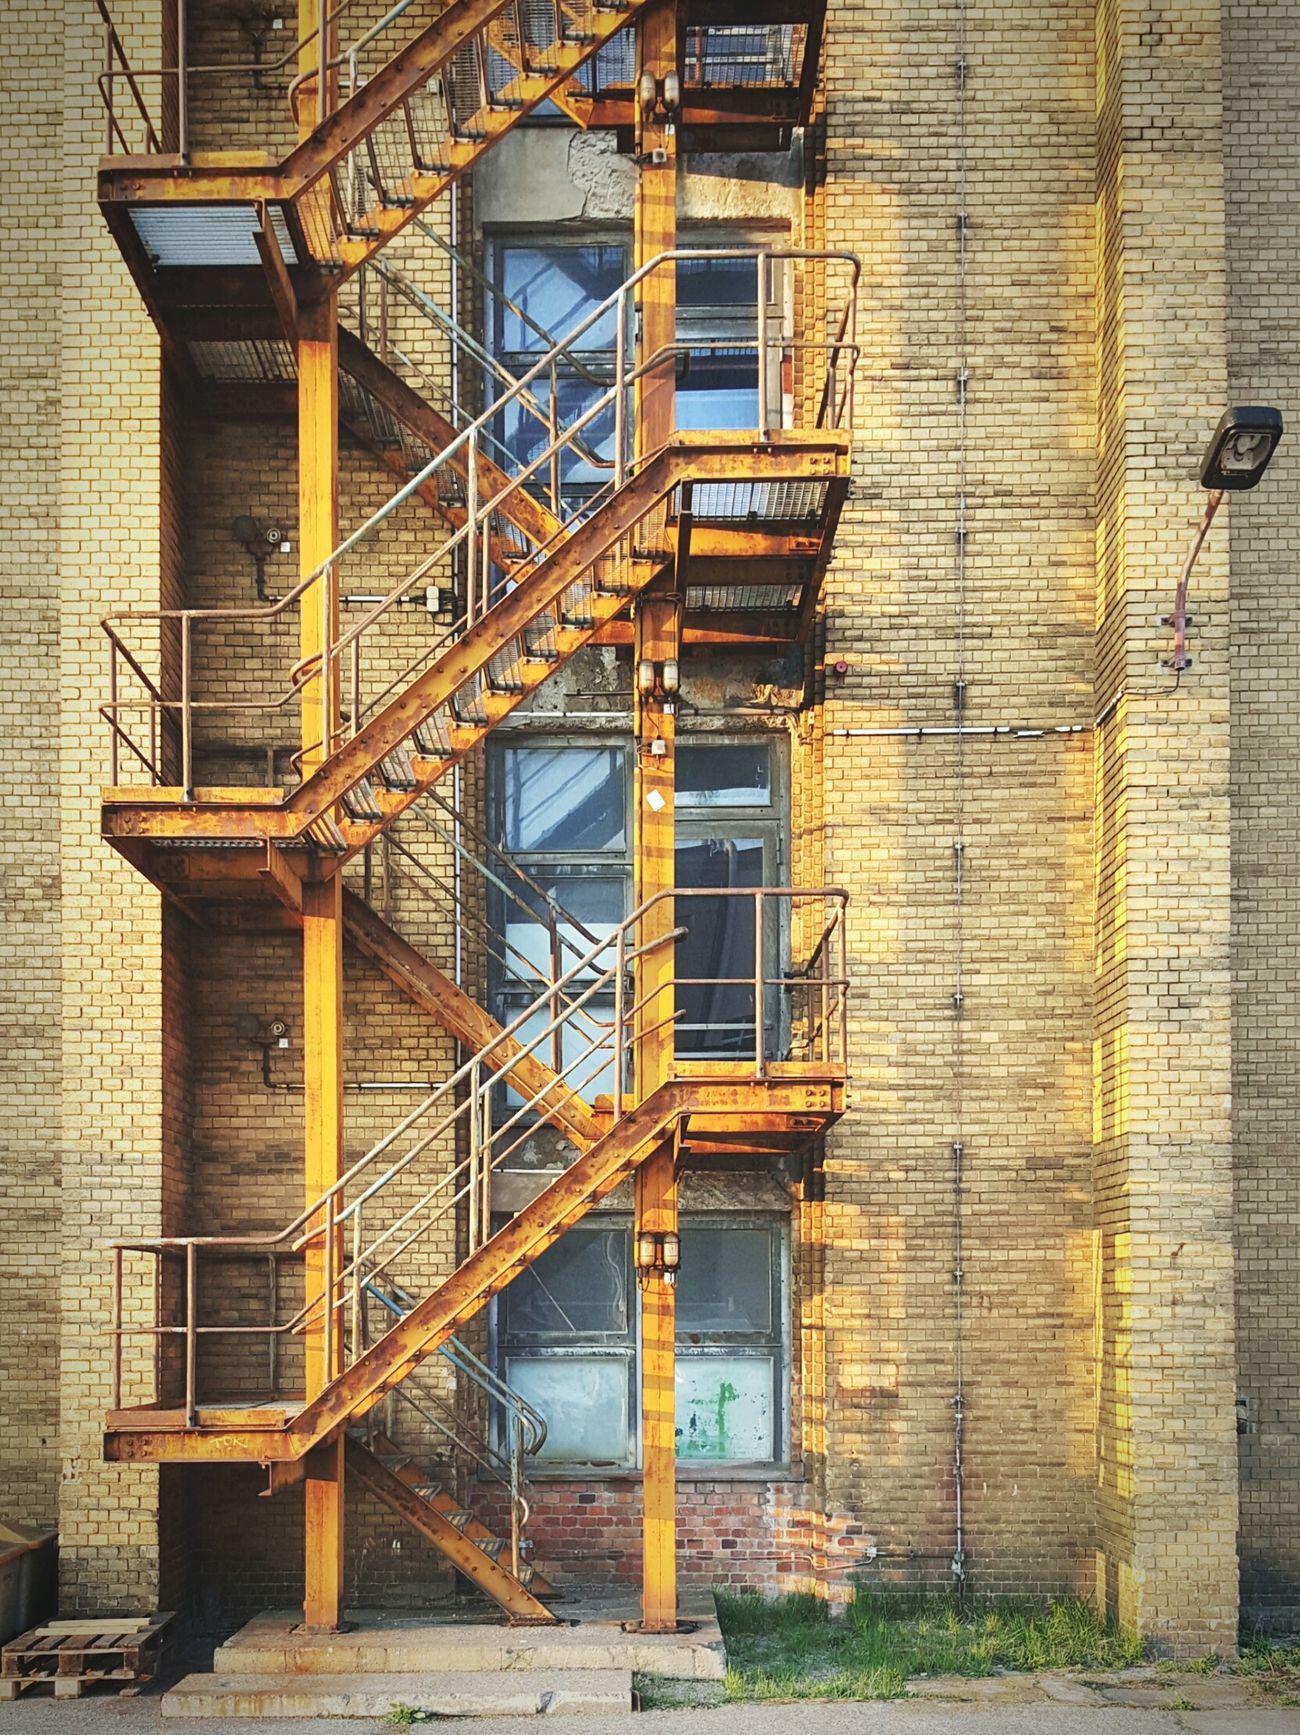 Hanging Out Taking Photos Stairs Fabric Industriekultur Bricks Steel Rusty Oberschöneweide Berlin